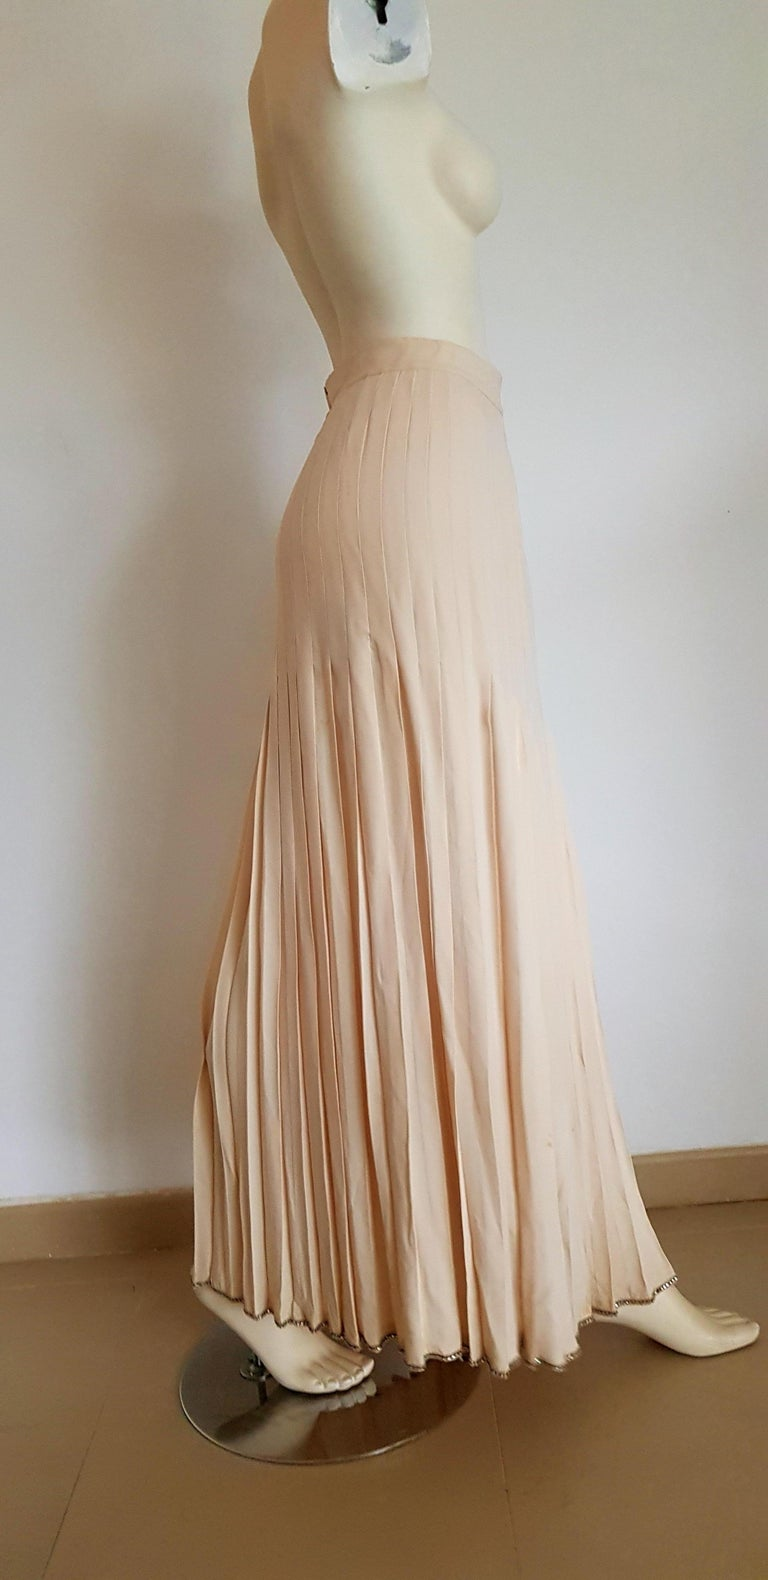 VALENTINO Haute Couture Top Skirt Swarovski Diamonds Waistband Silk Dress-Unworn For Sale 3